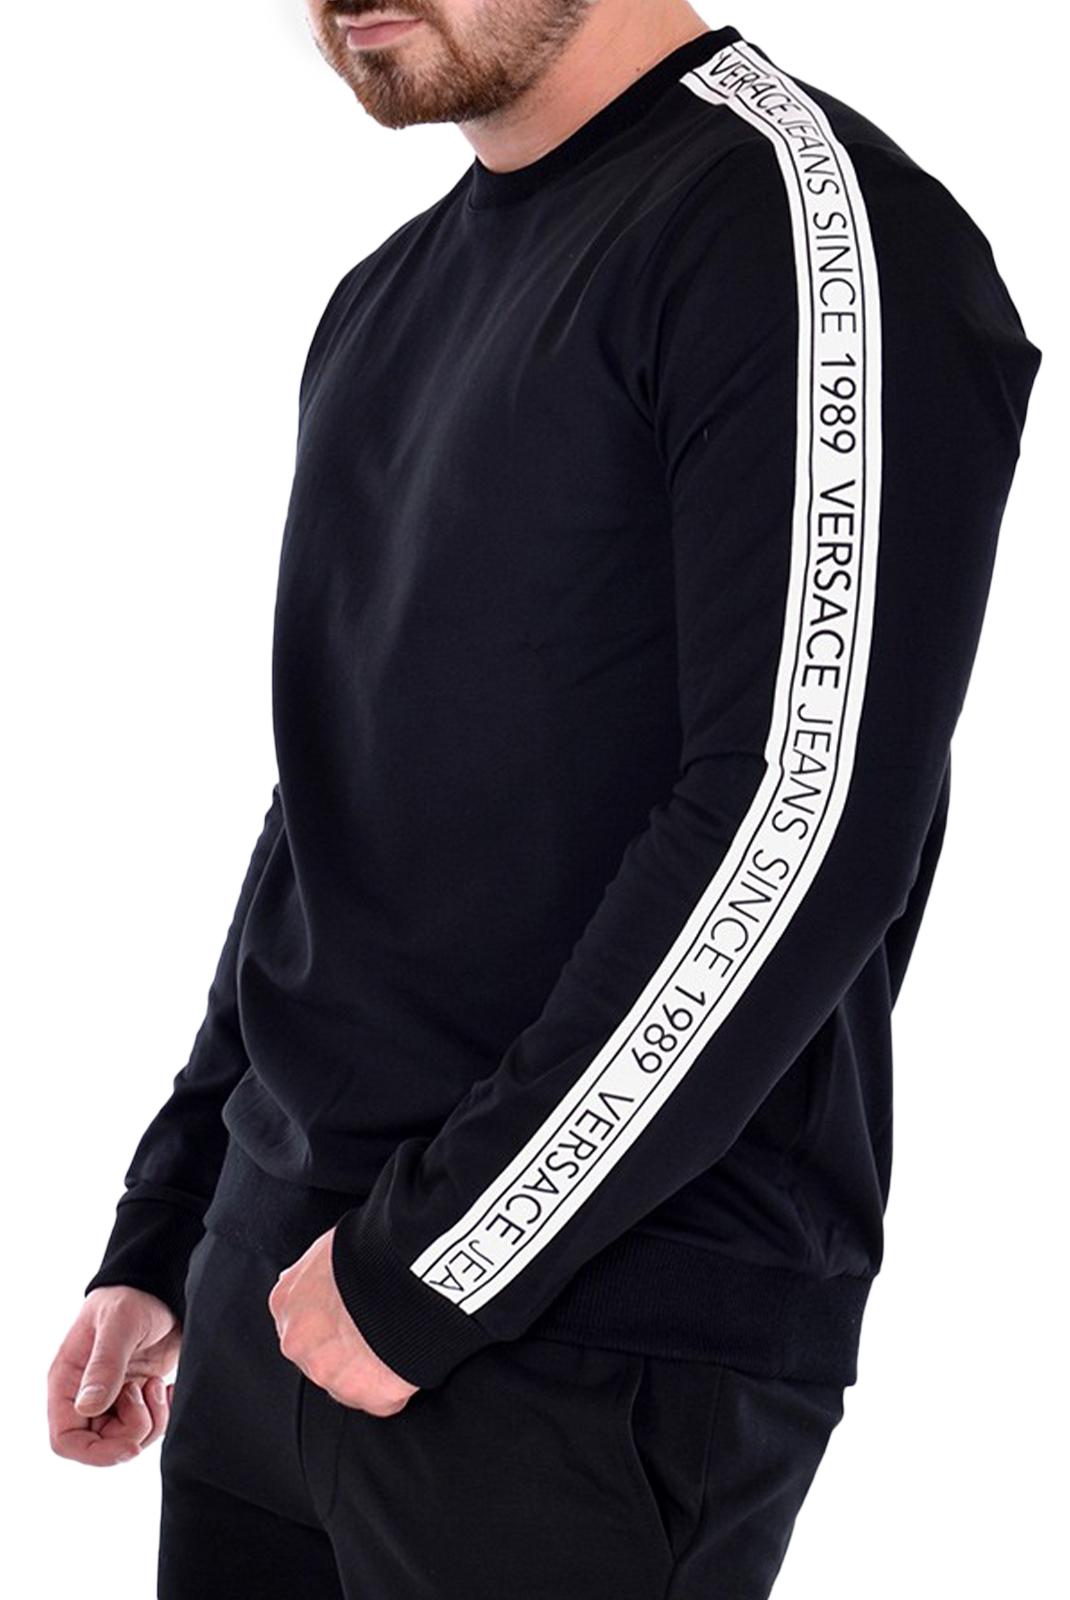 Versace Jeans B7GTB7F9-TUM300 noir